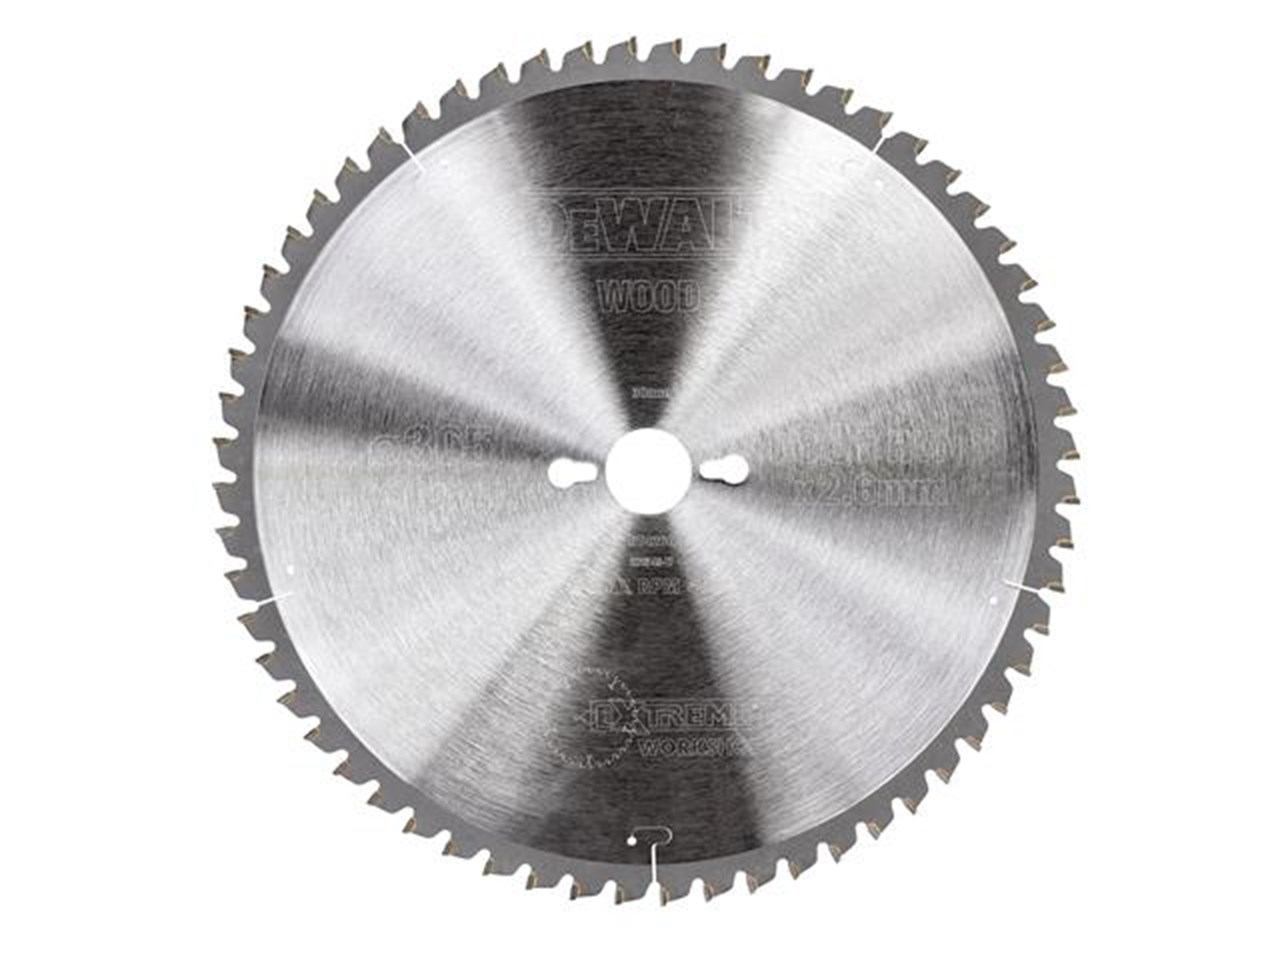 Dewalt dt4260 qz 305mm x 30mm x 60t extreme mitre saw blade keyboard keysfo Images